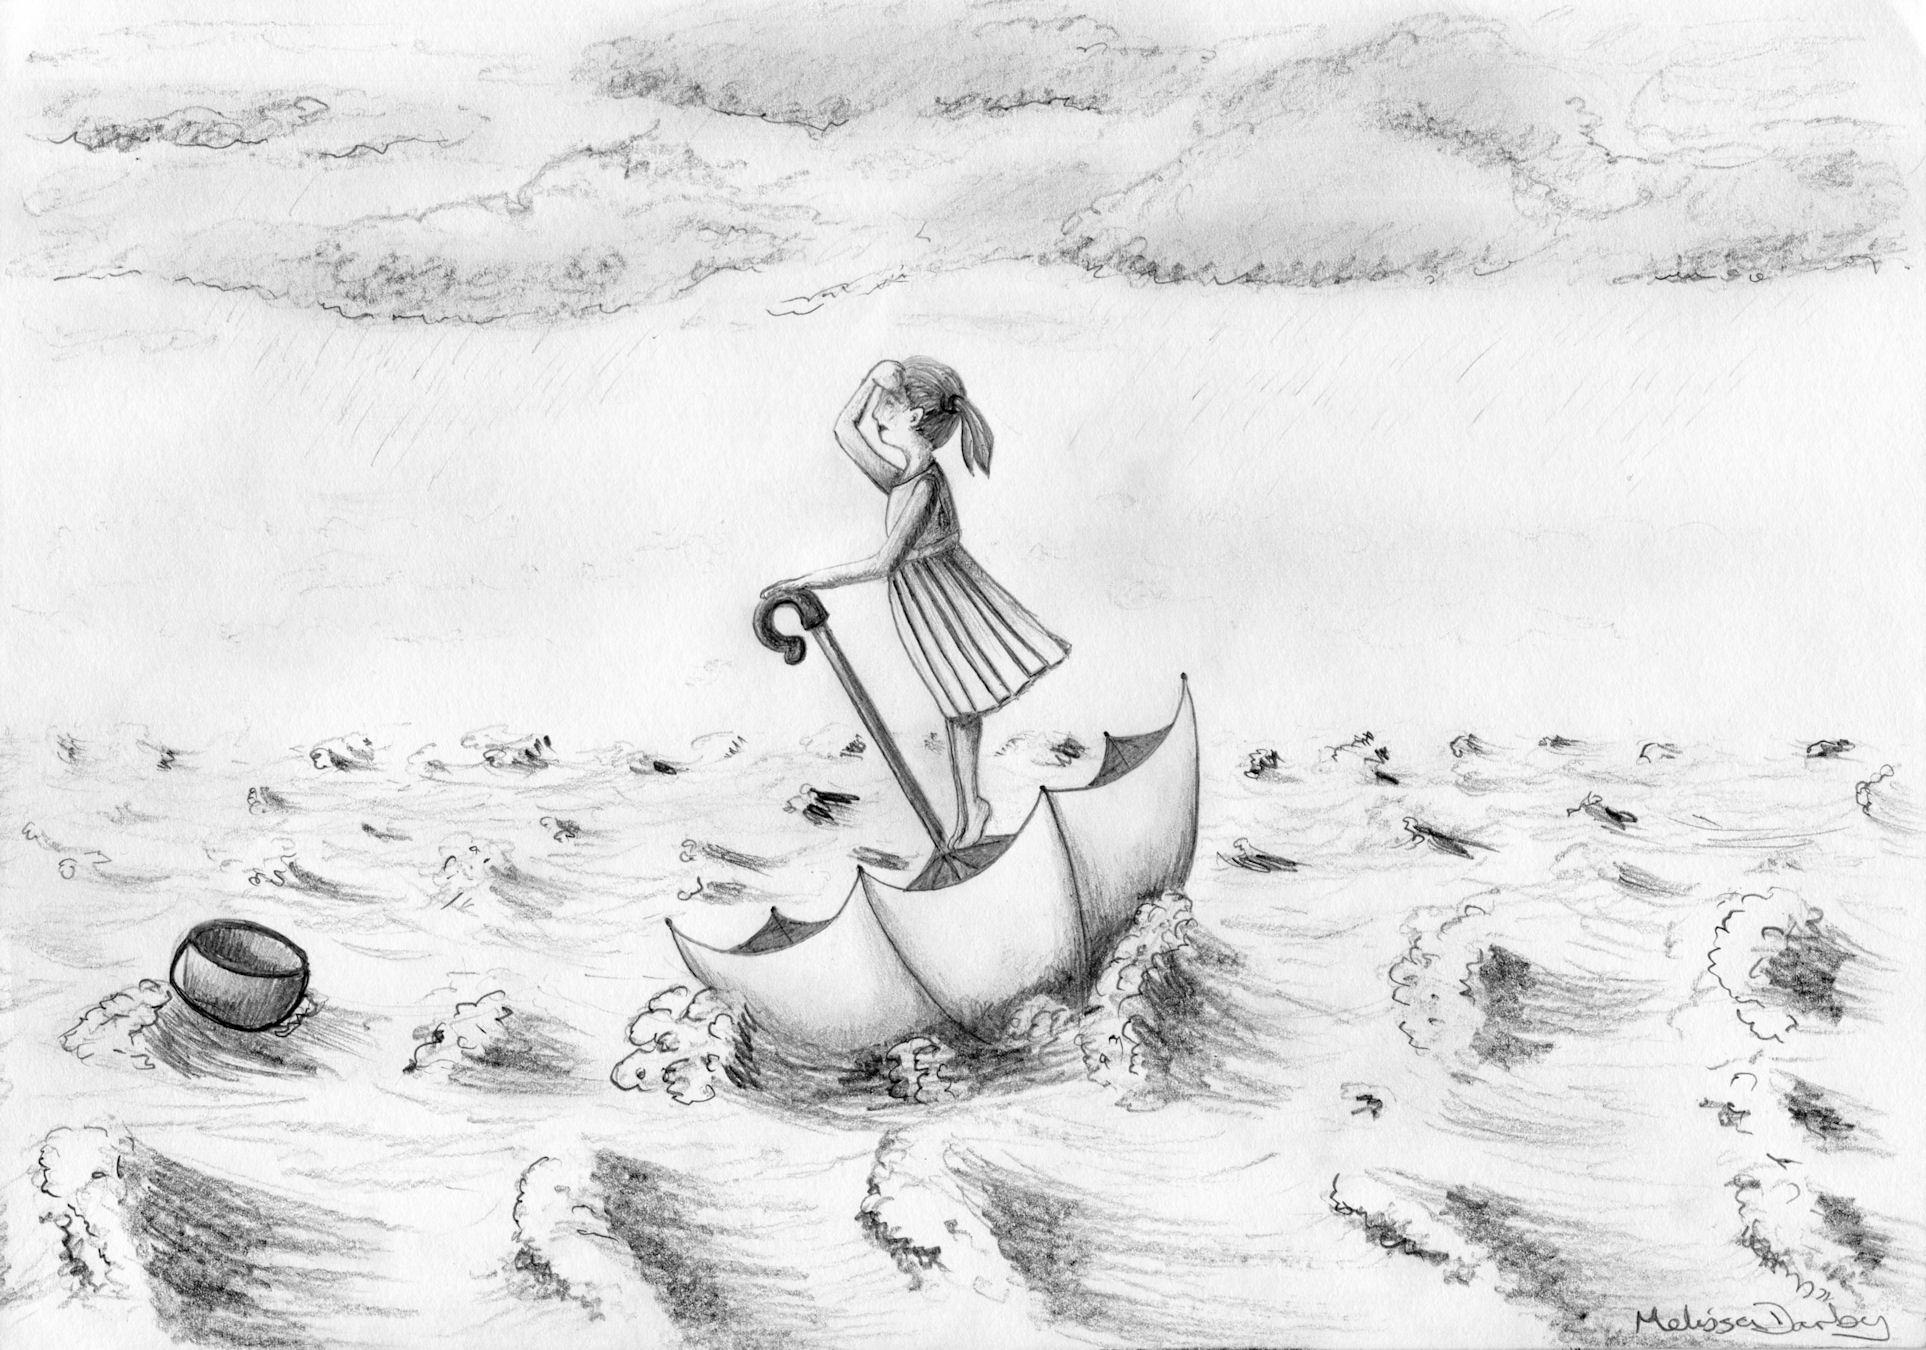 Drawn rain pencil sketch Art Share Darby pencil this: